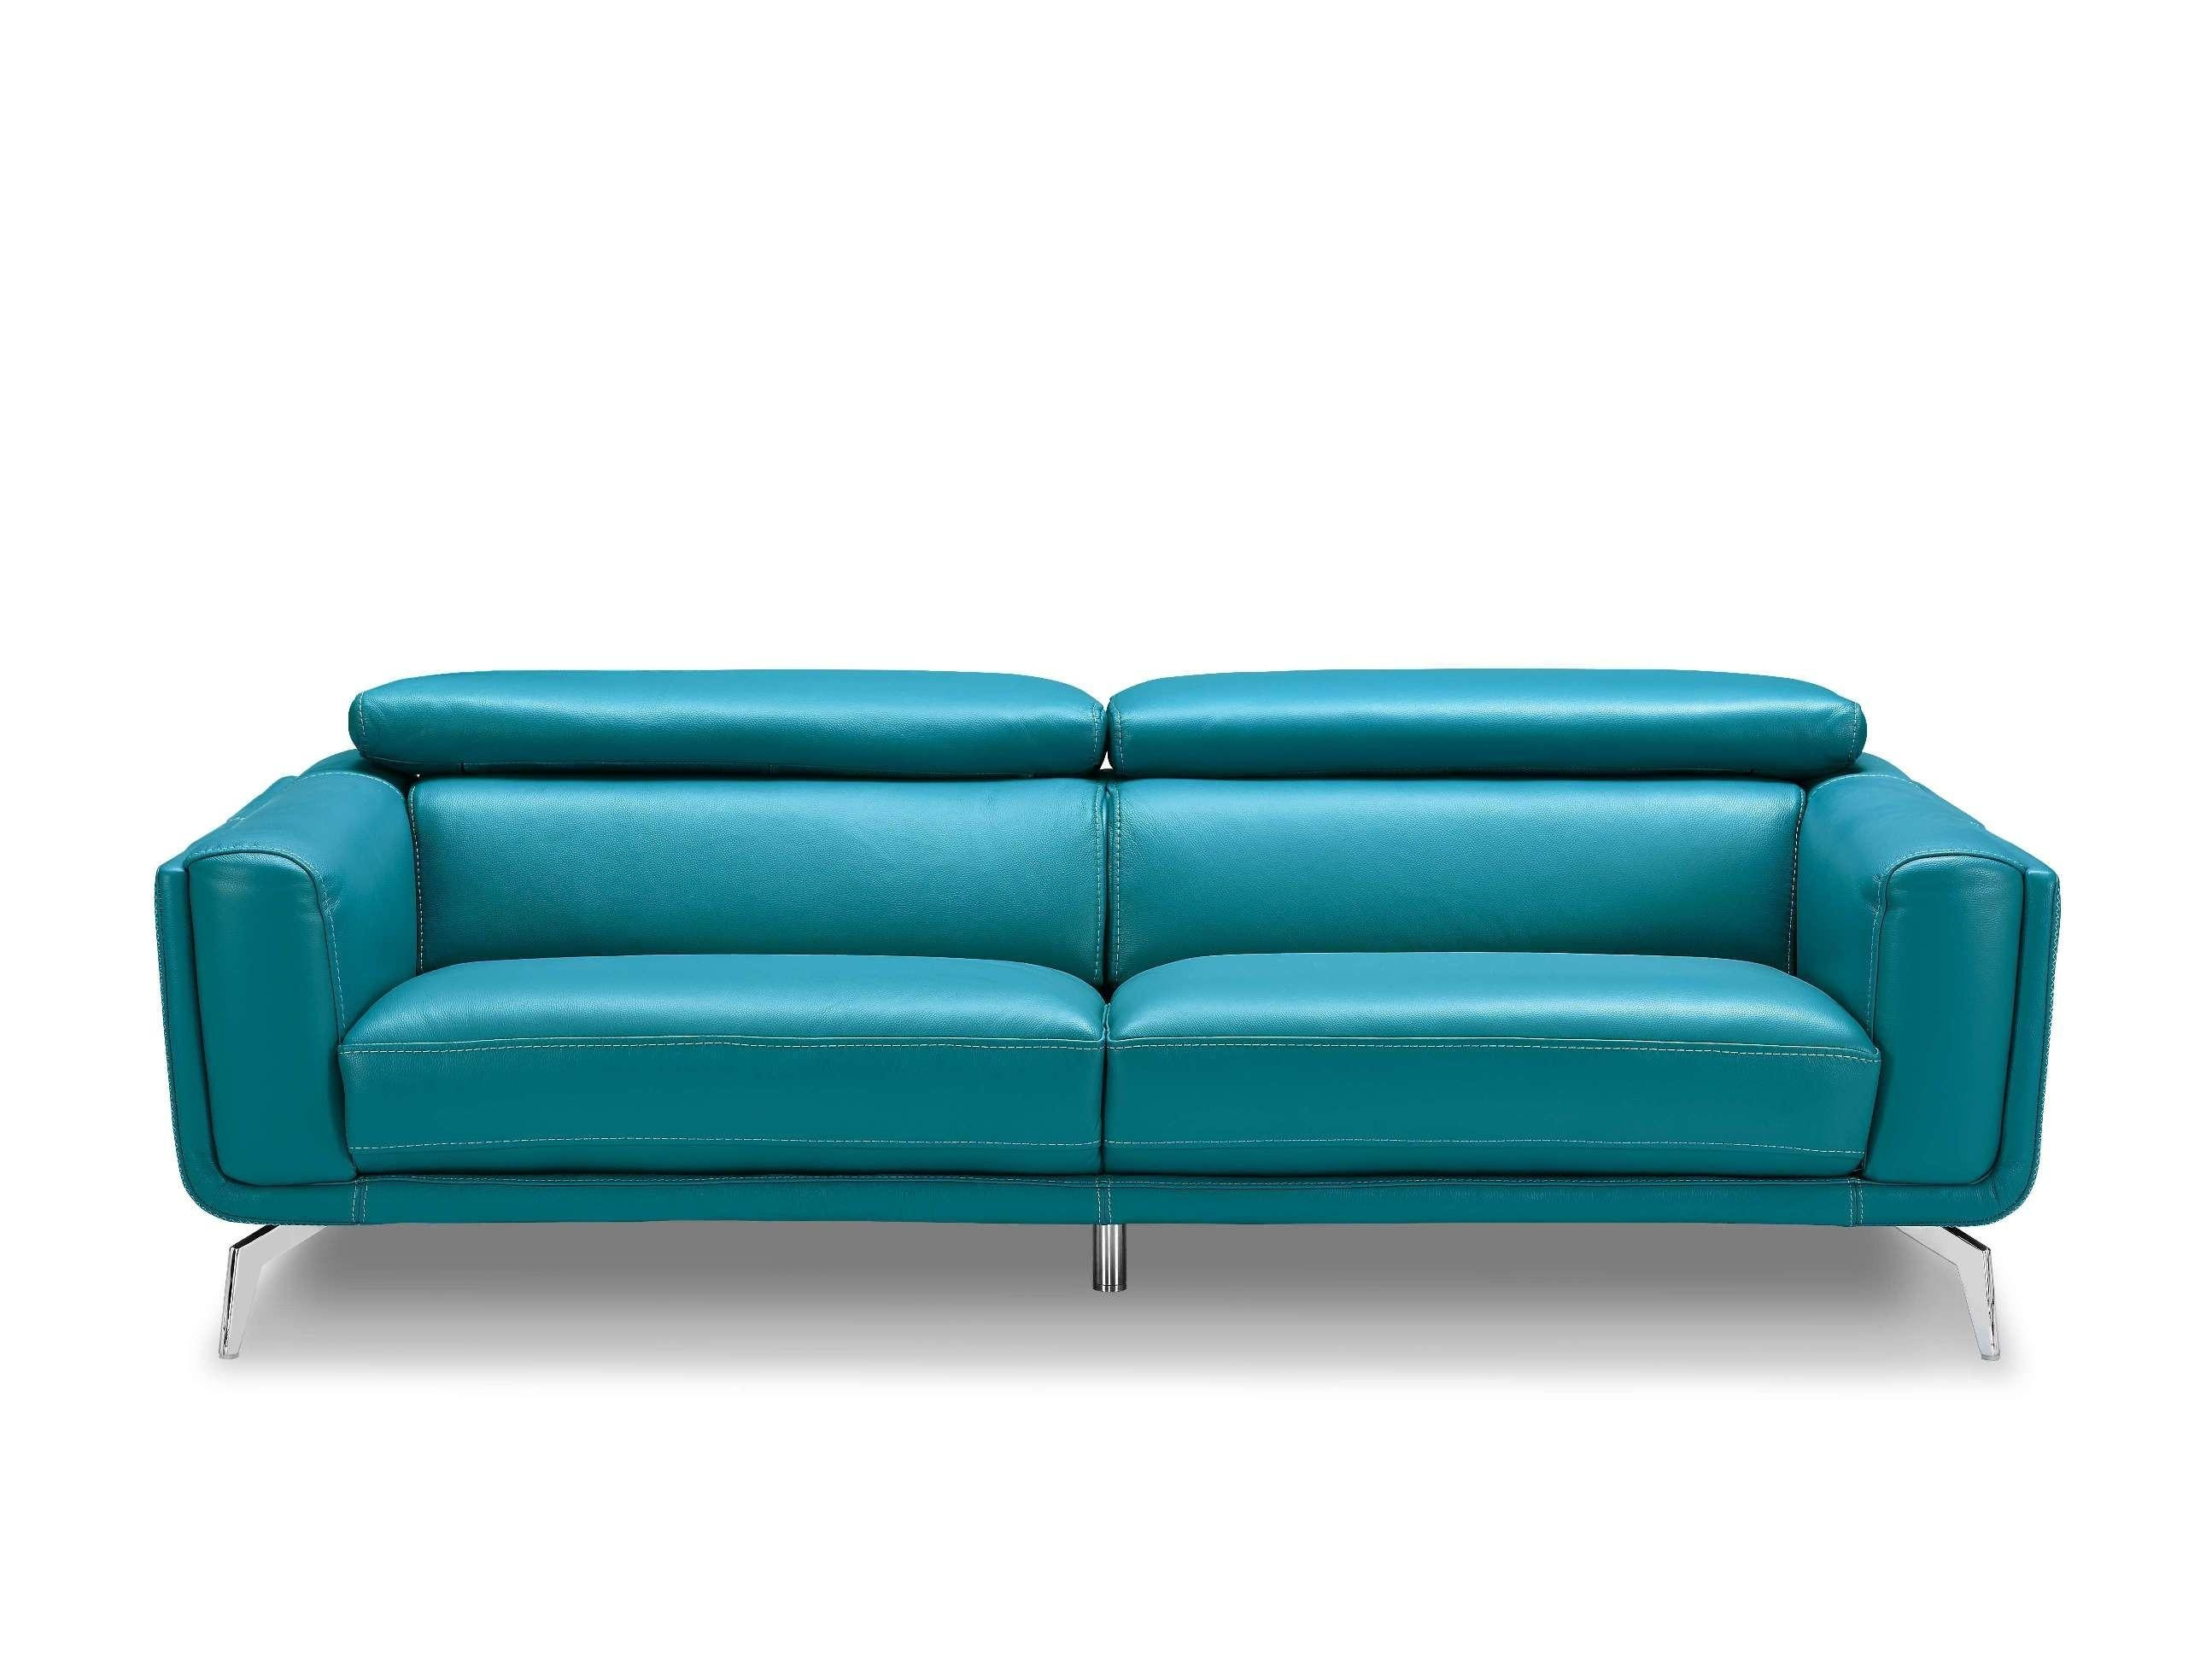 Sofa With Chrome Legs Dazzling Modern Black Sofas Tufted Elijah In Sofas With Chrome Legs (Image 15 of 20)